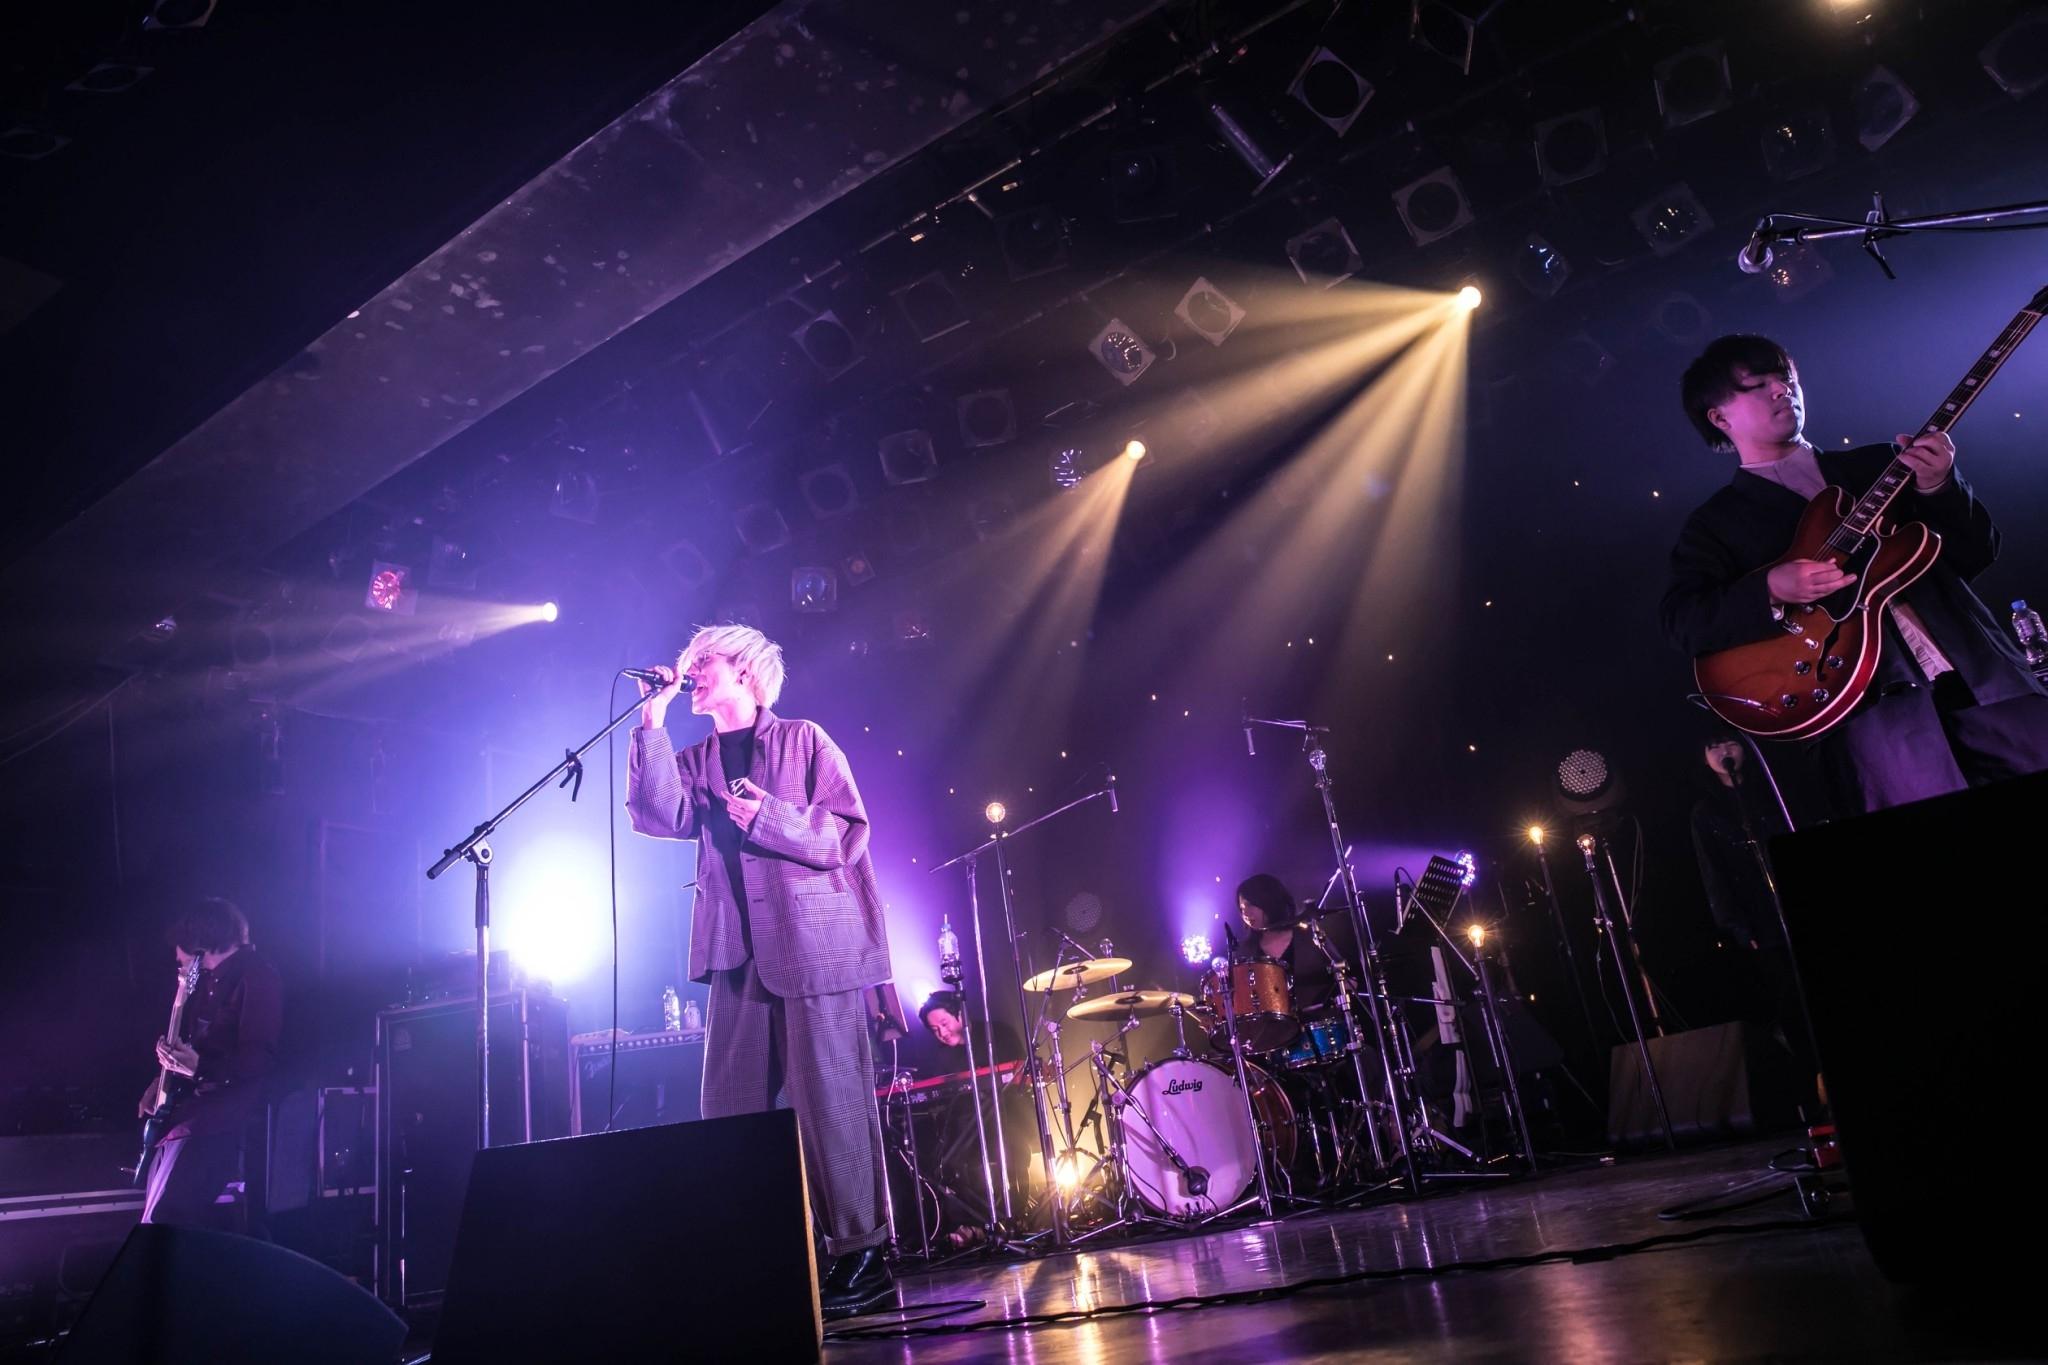 『the quiet room Concept Oneman Live 2020 - グレイトエスケイプ -』ライブ写真  撮影=中山優司